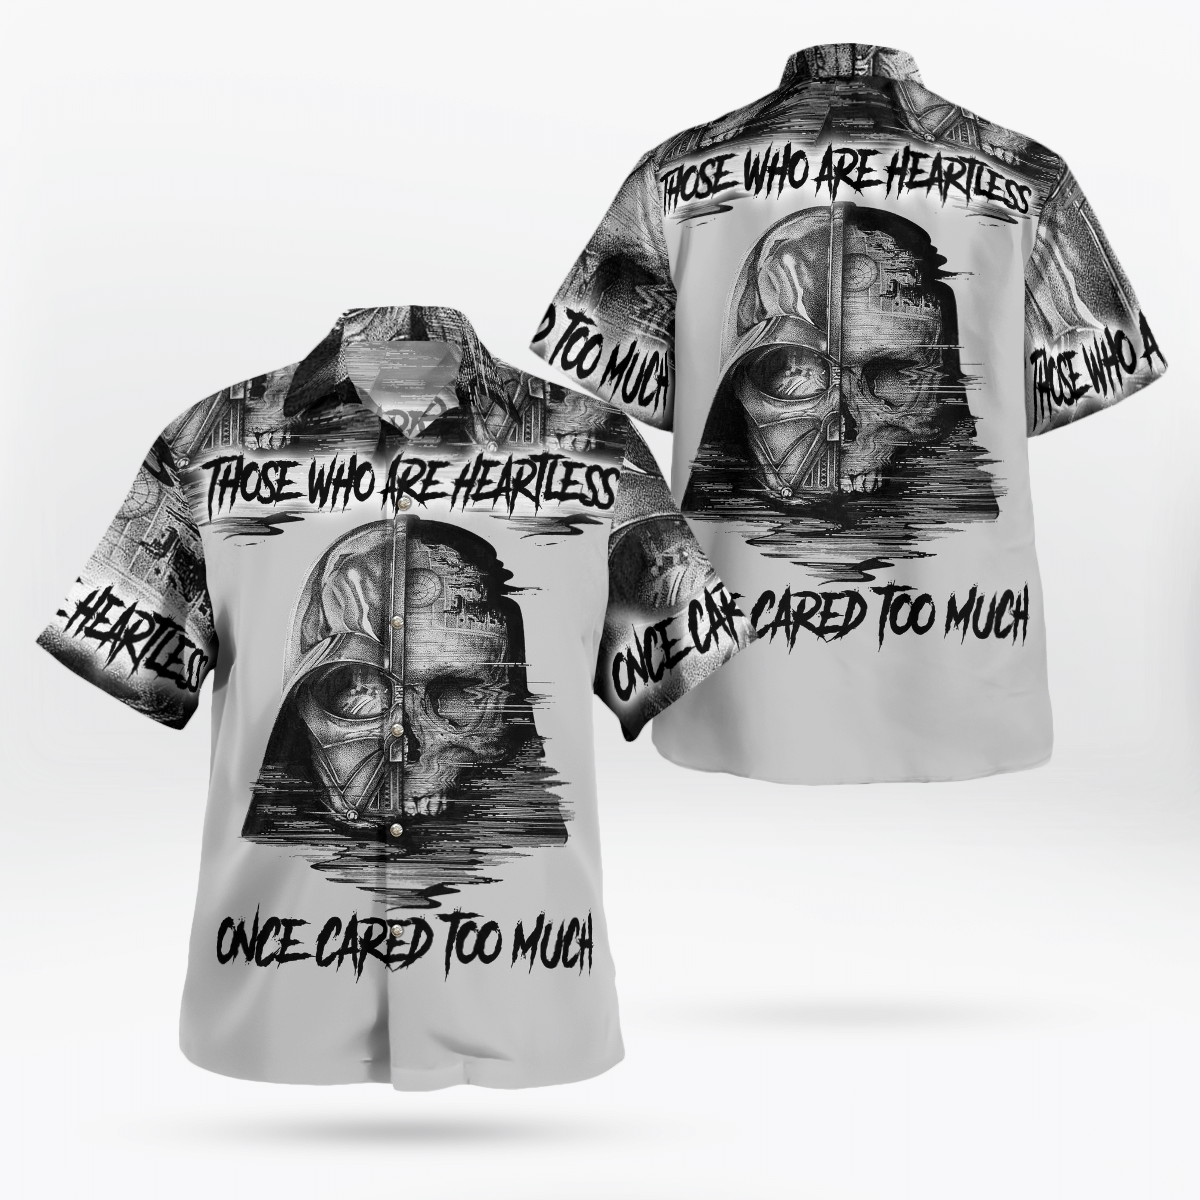 Darth Vader Skull heartless cared too much Hawaiian Shirt